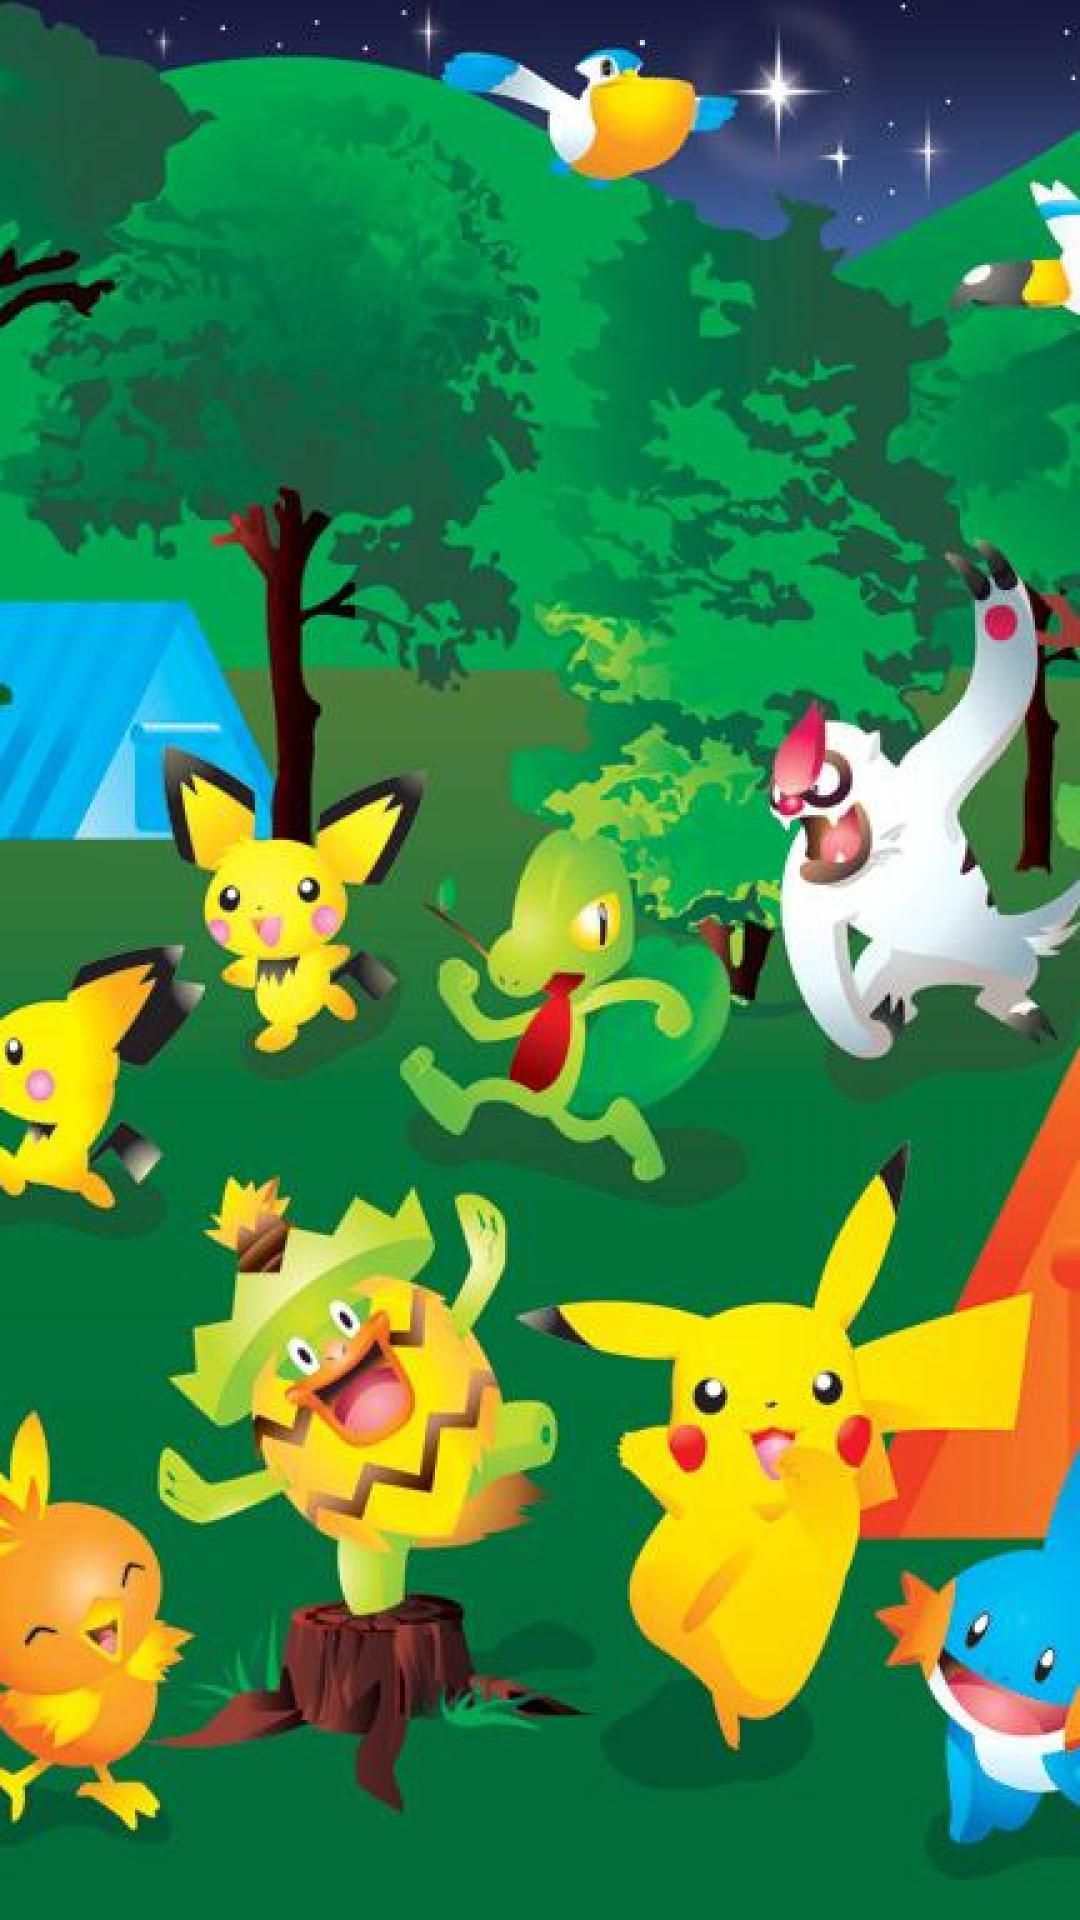 Legendary Pokemon Wallpaper Background Great Wallpaper 2048 By 1152 Pixel Pictures Pokemon 180374 Hd Wallpaper Backgrounds Download